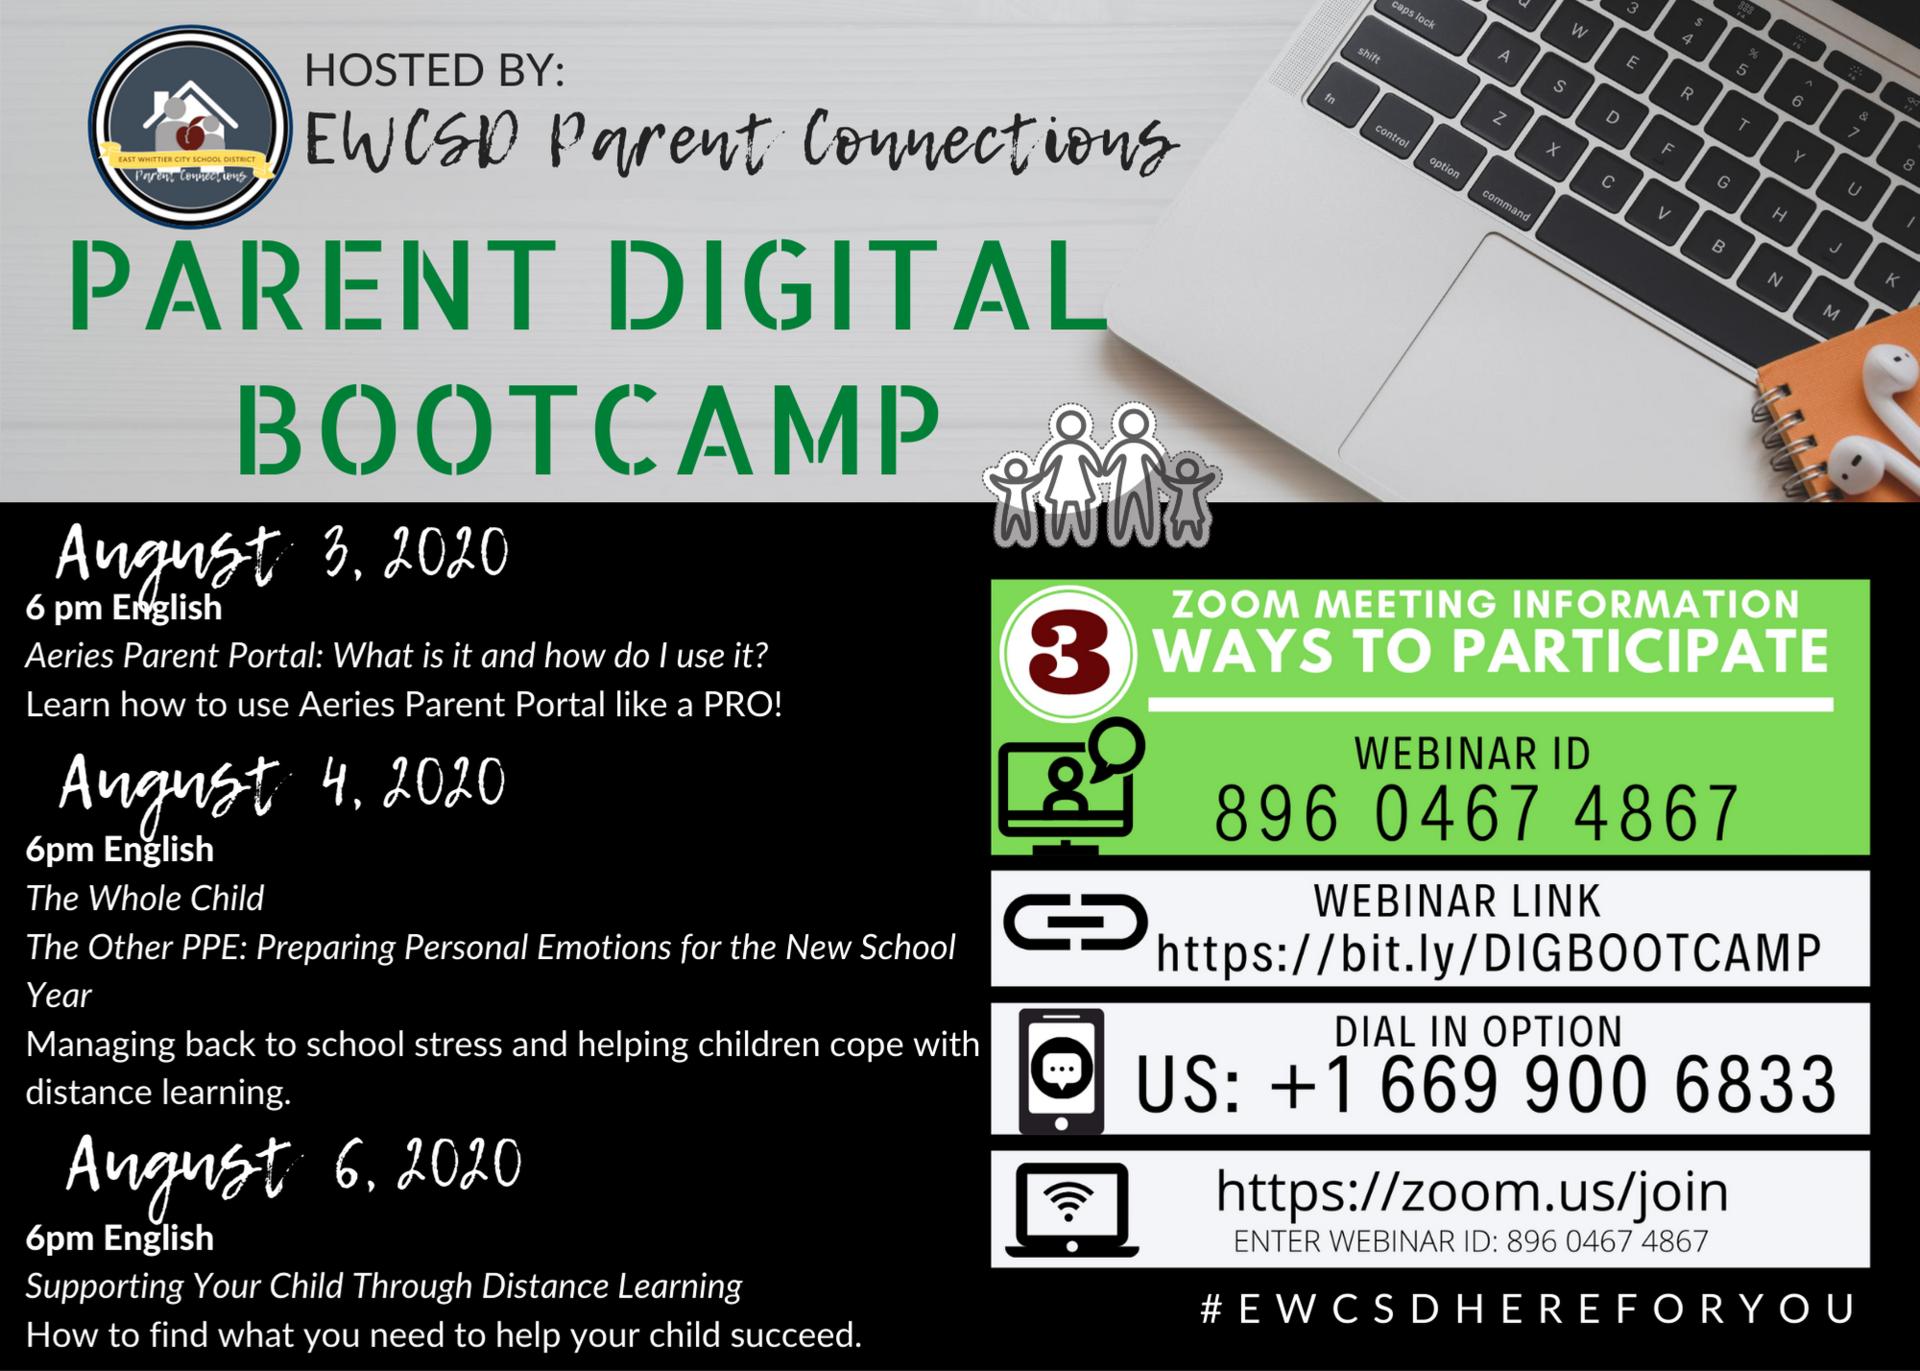 Parent Digital Bootcamp